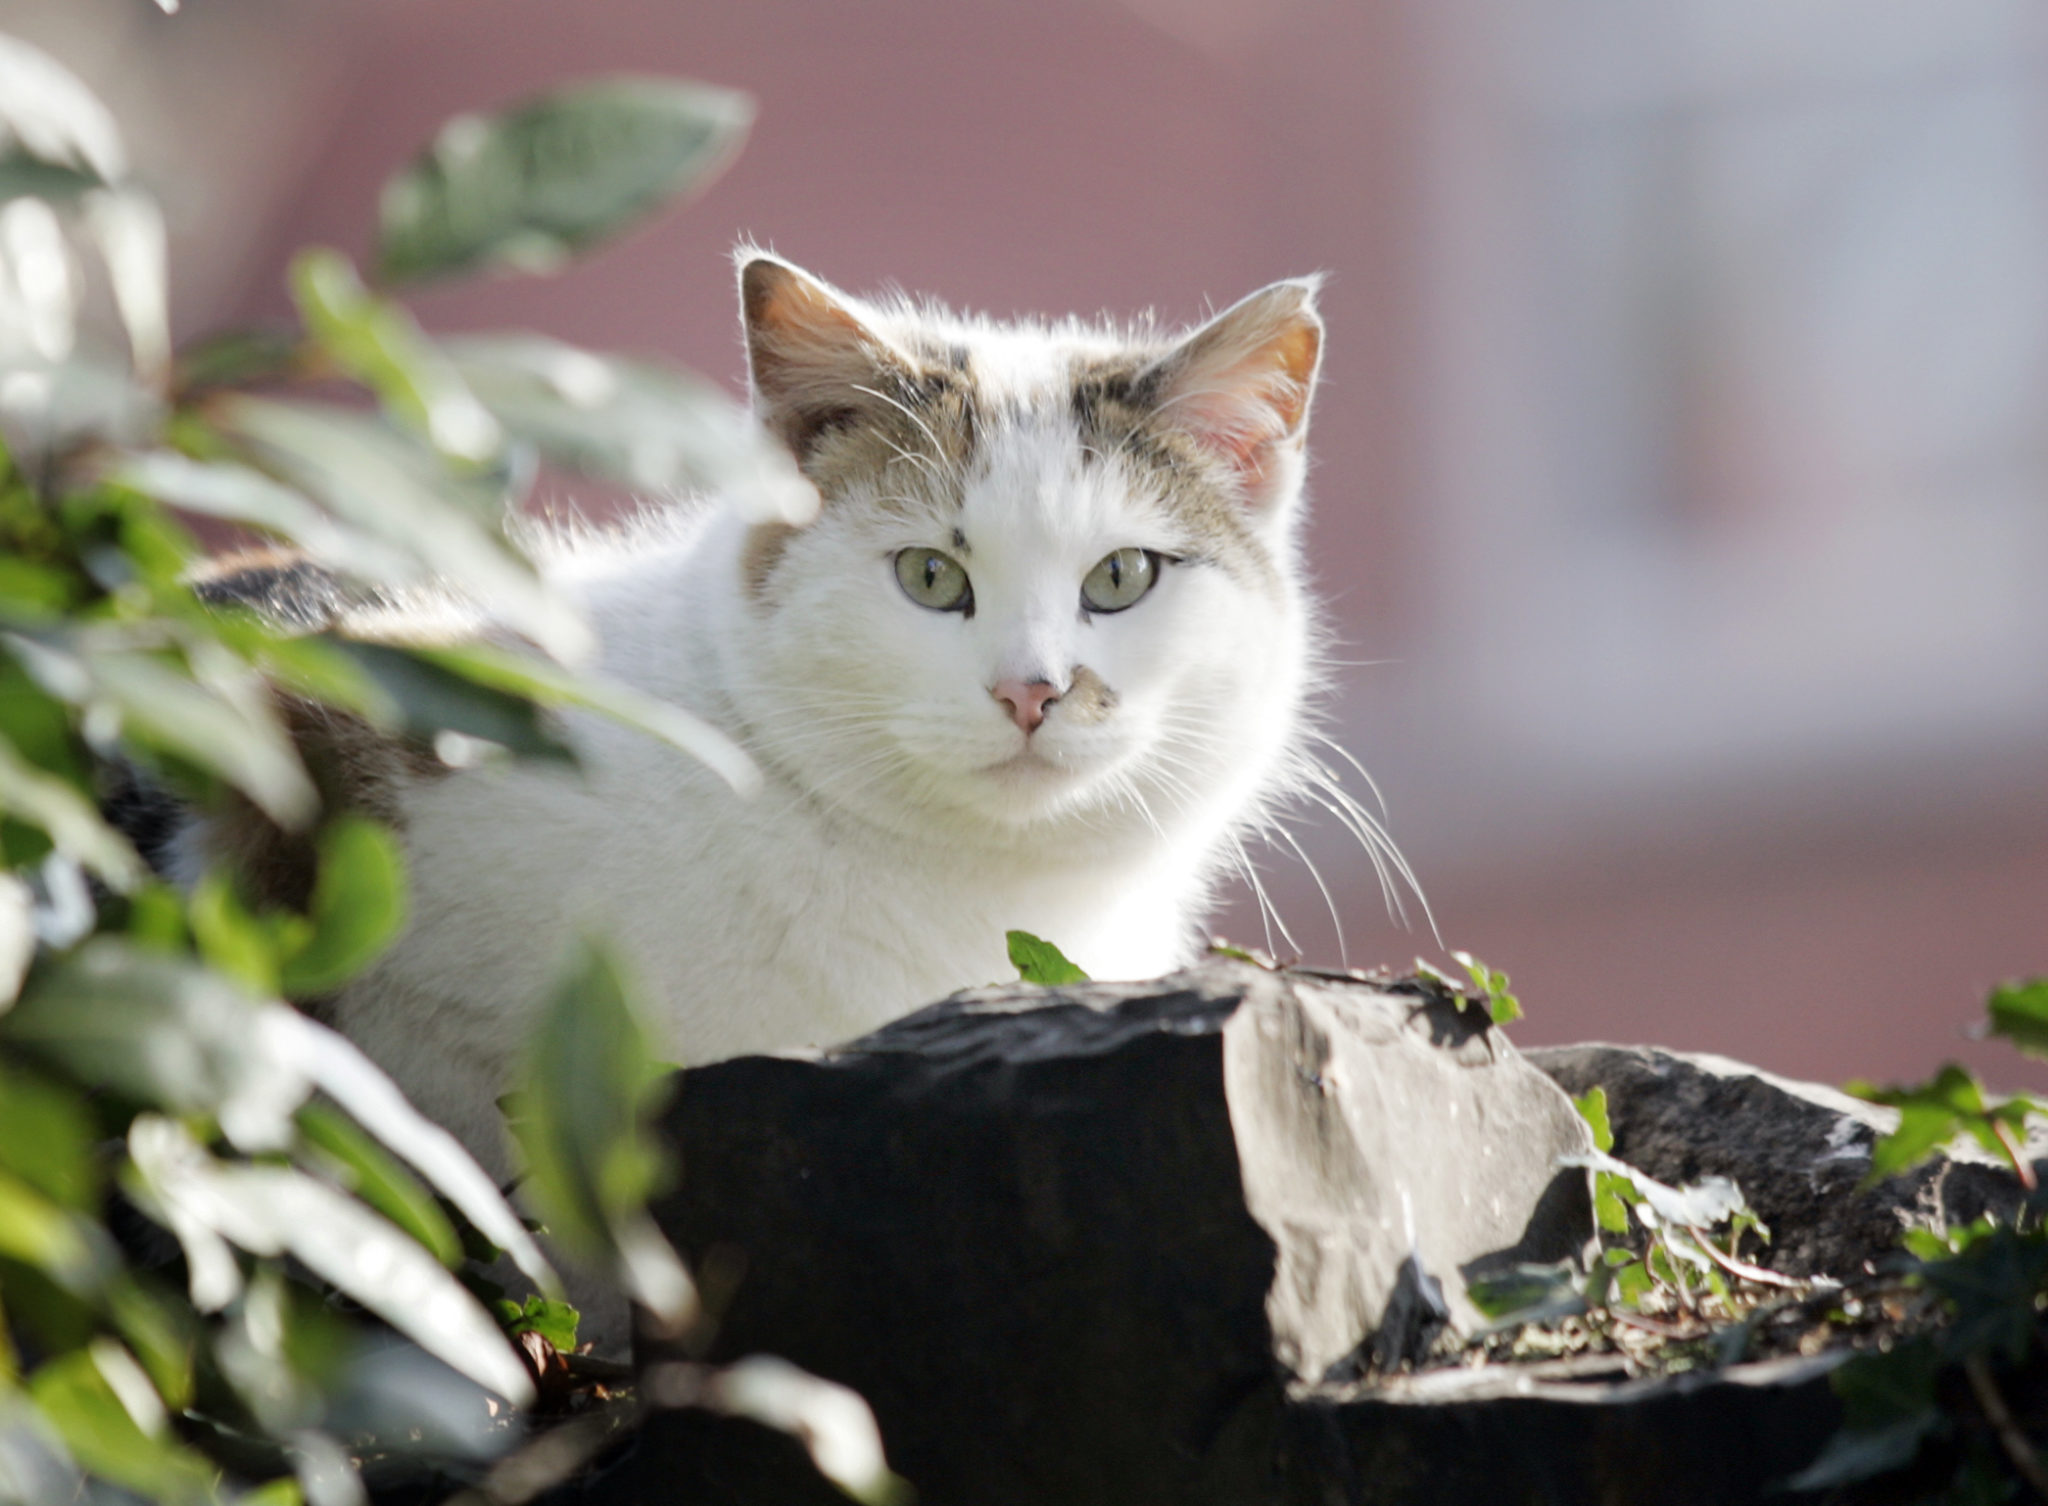 A neighbourhood cat enjoys the springtime sun